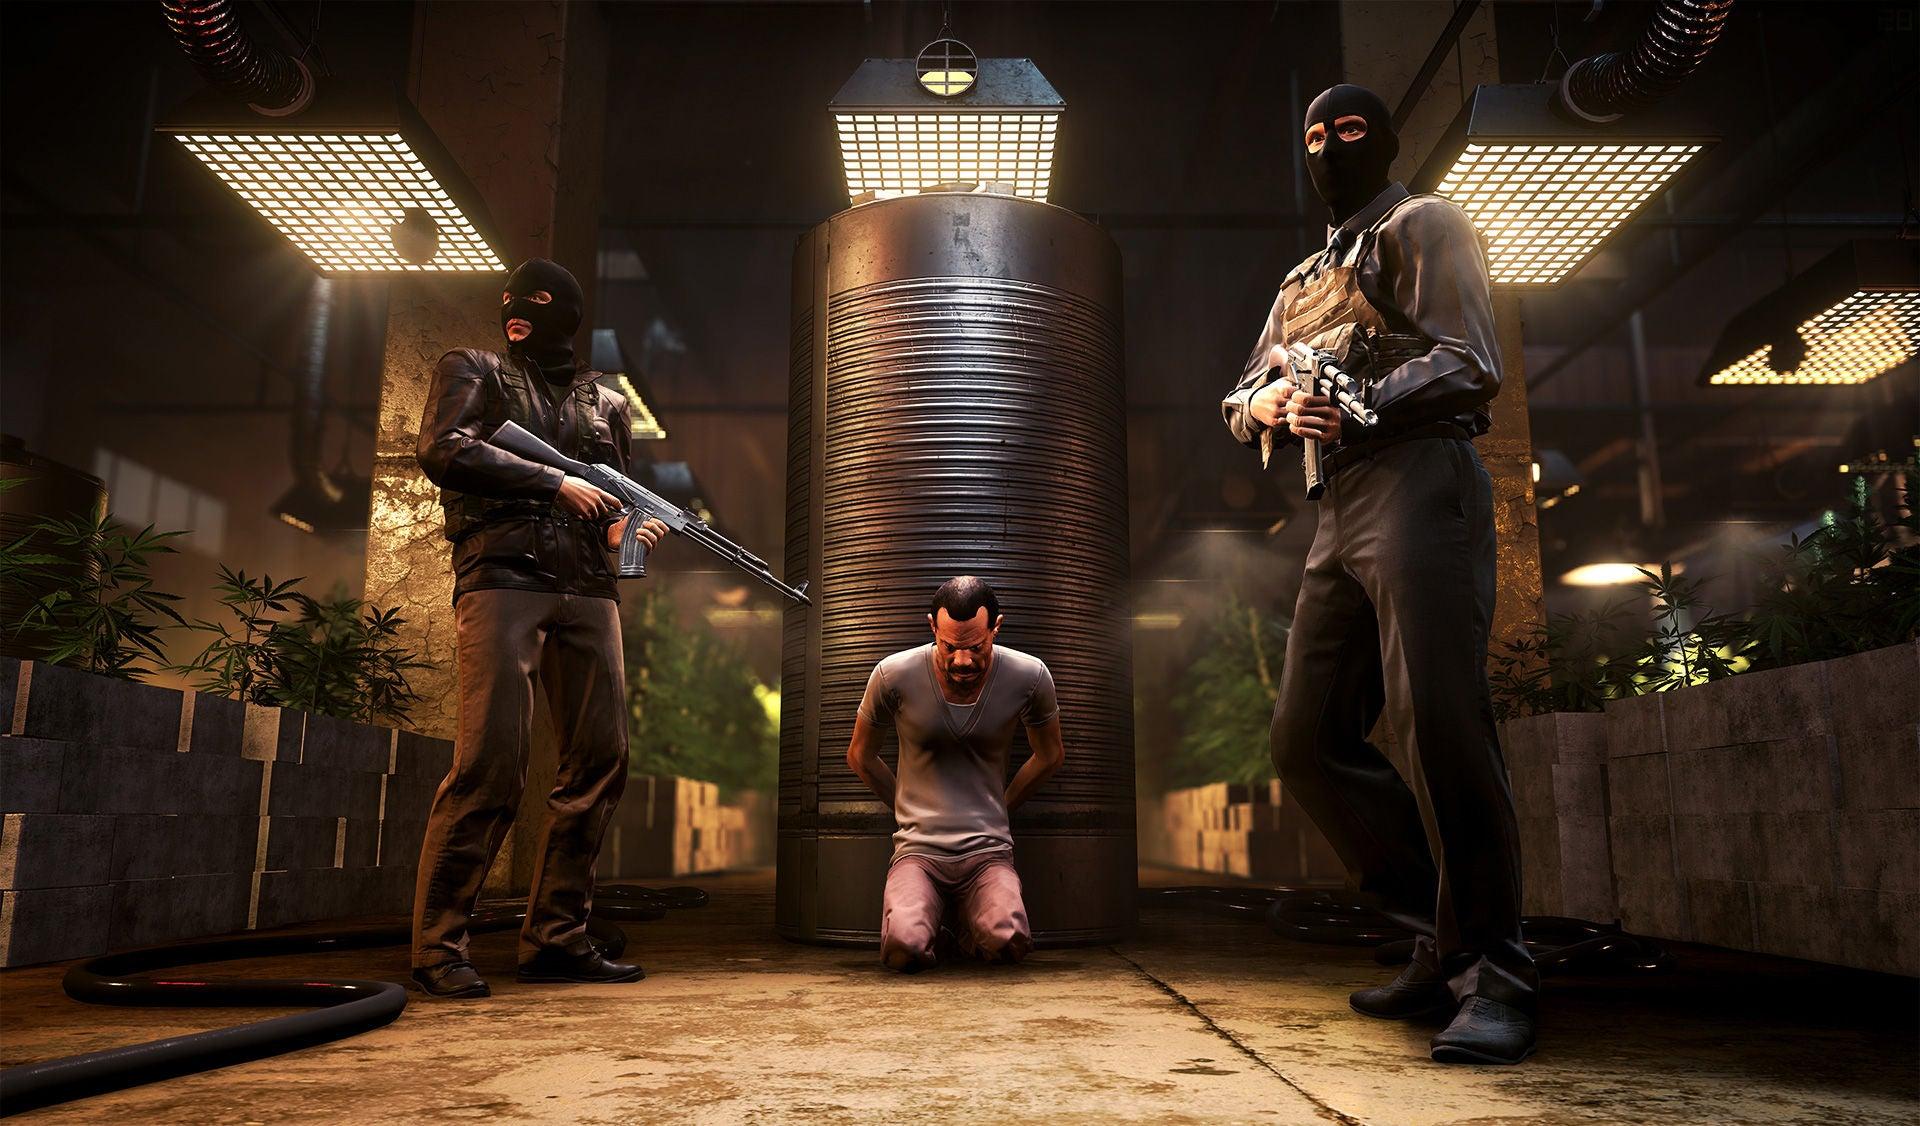 Image for New Battlefield Hardline screenshots pump up the action (and alligators)